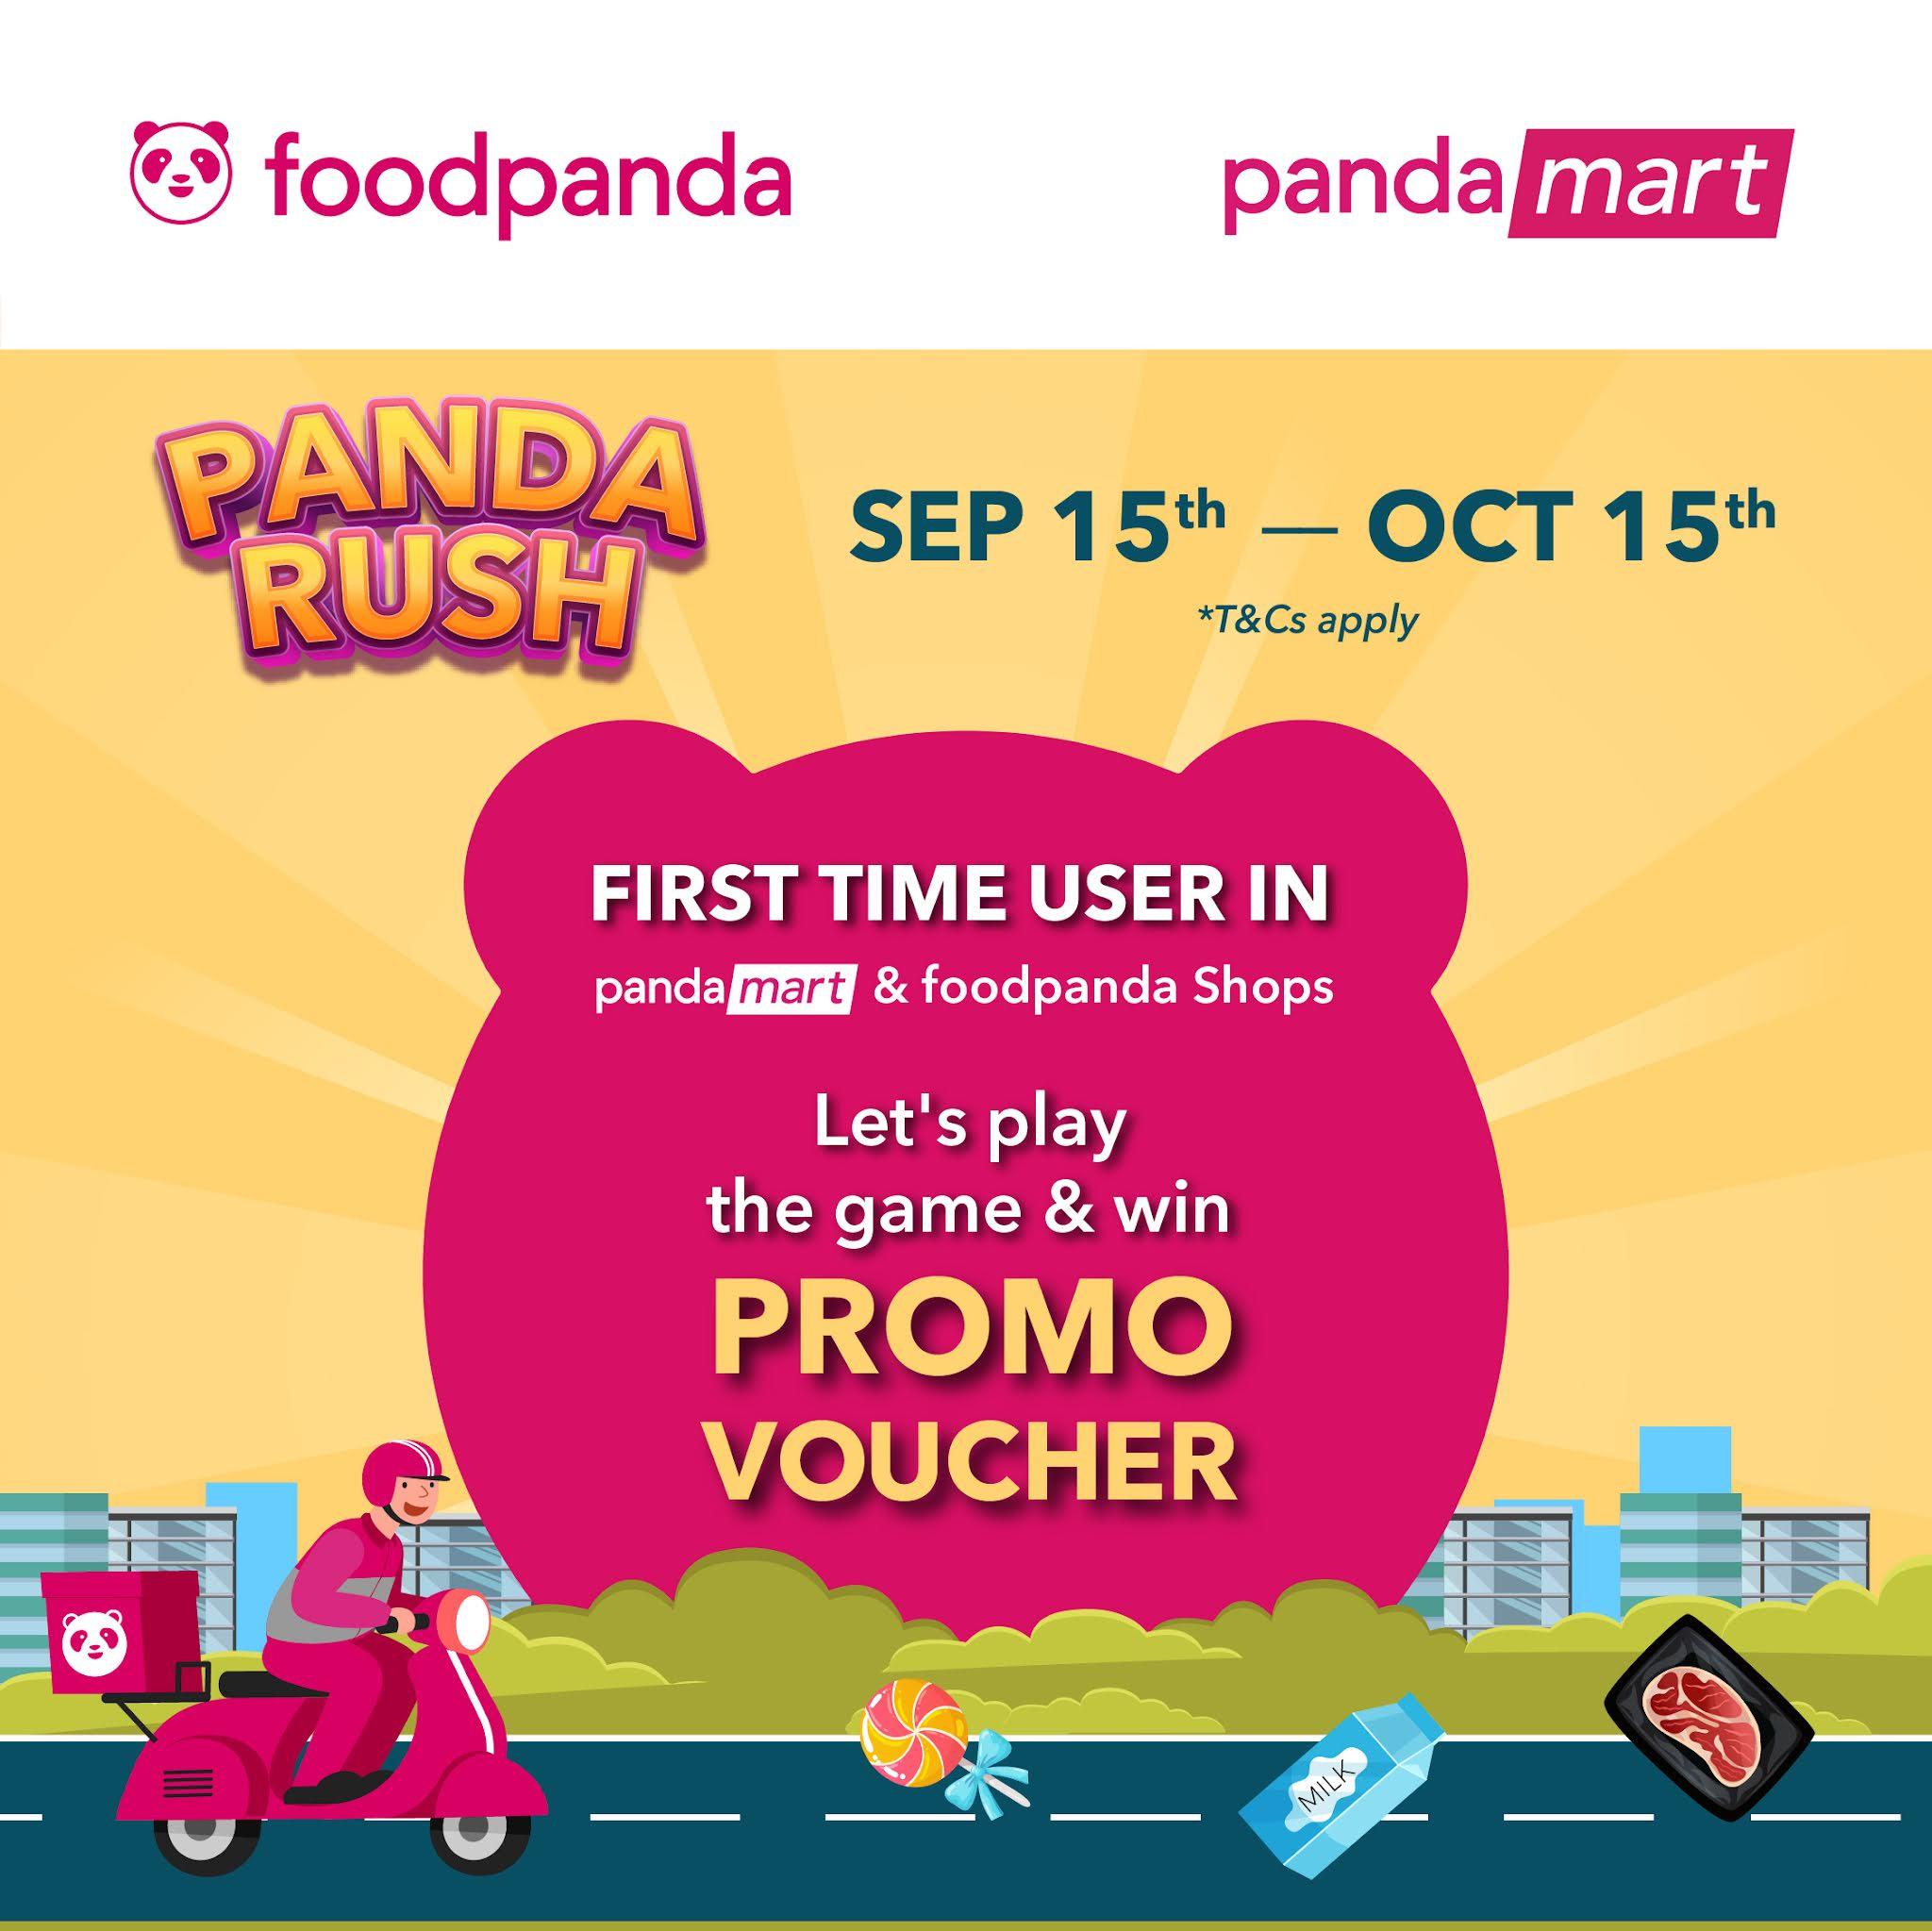 enjoy digital discounts for pandamart & foodpanda shops and win foodpanda merchandise